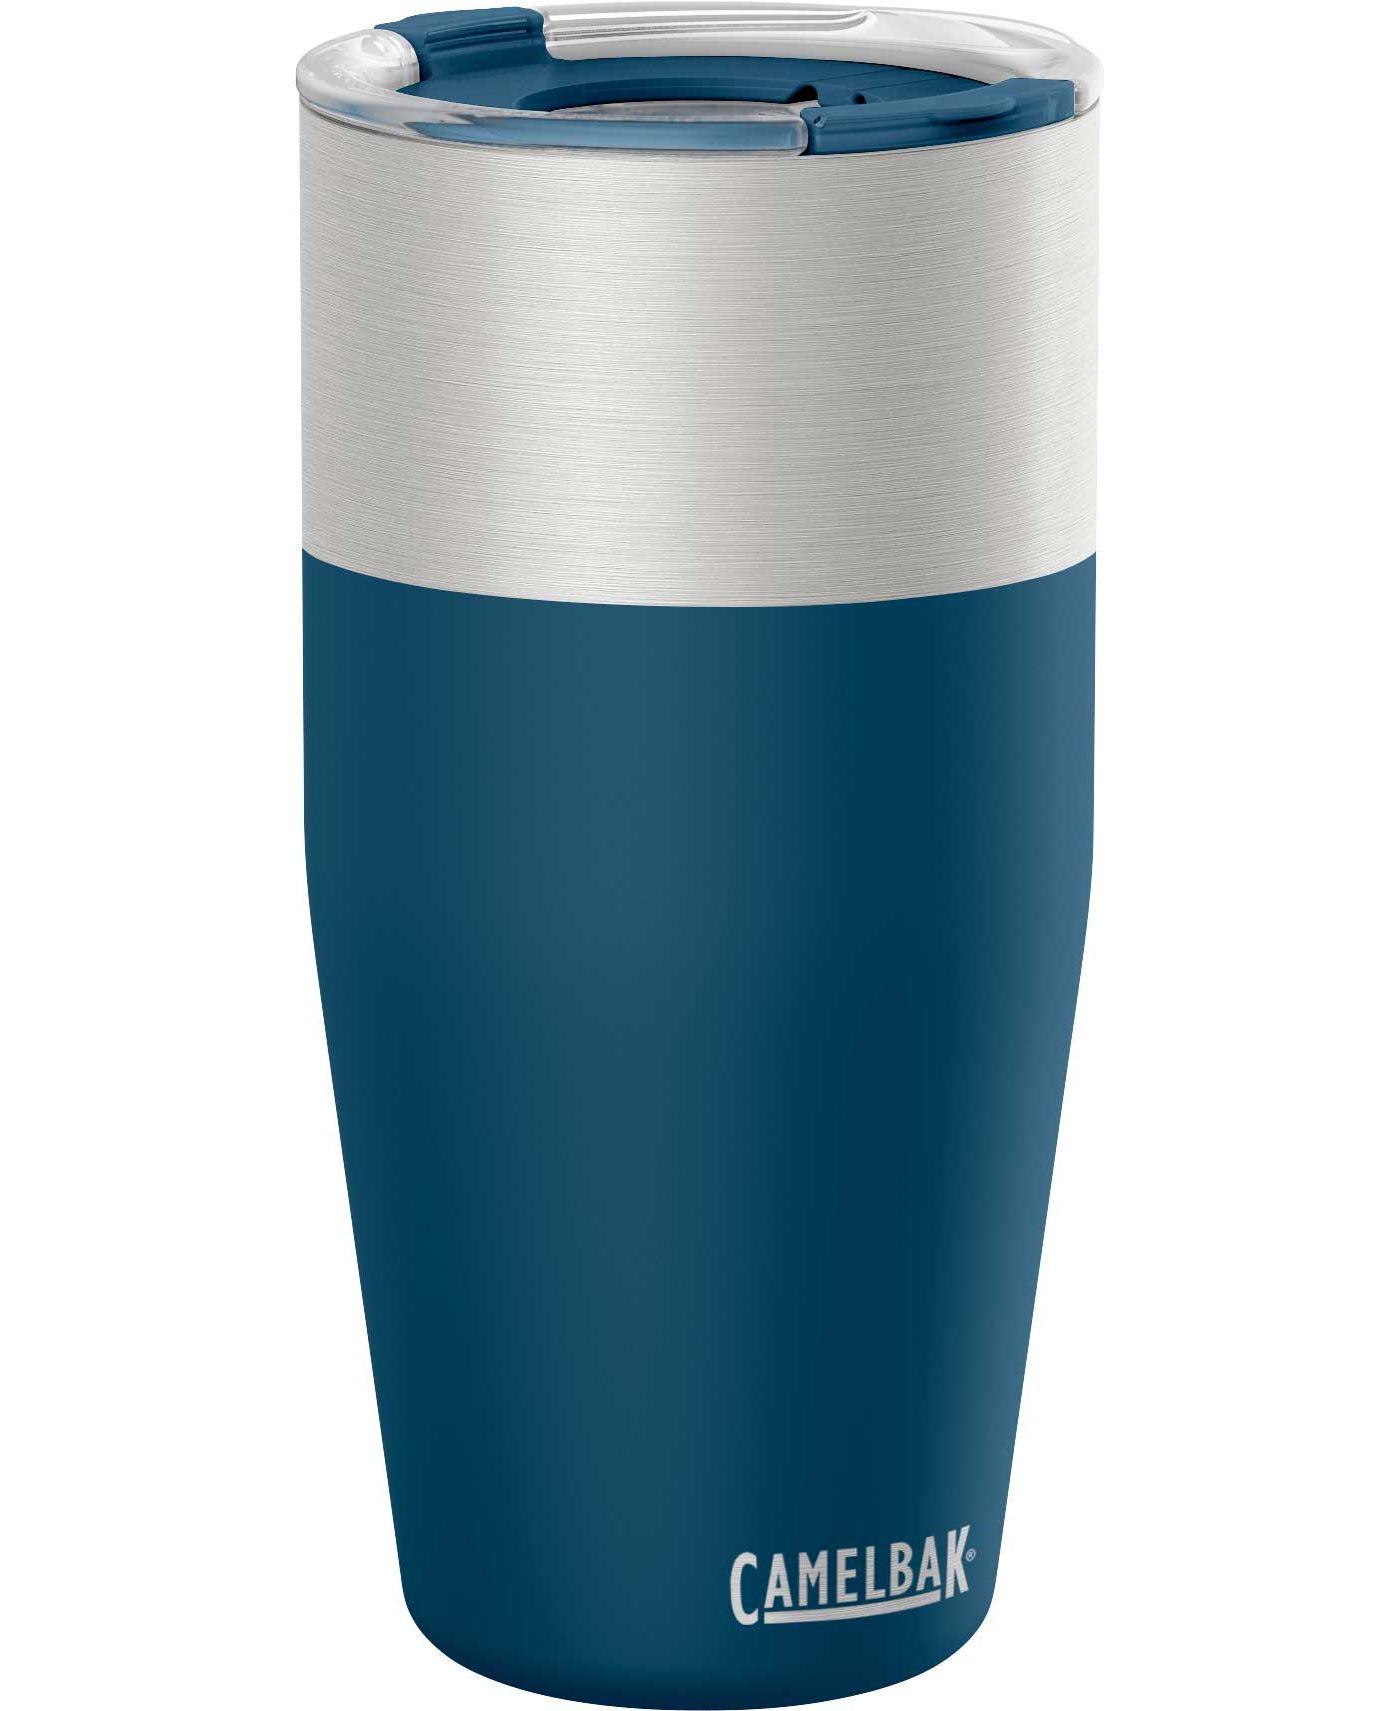 Camelbak Kickback 20 oz. Vacuum Insulated Tumbler